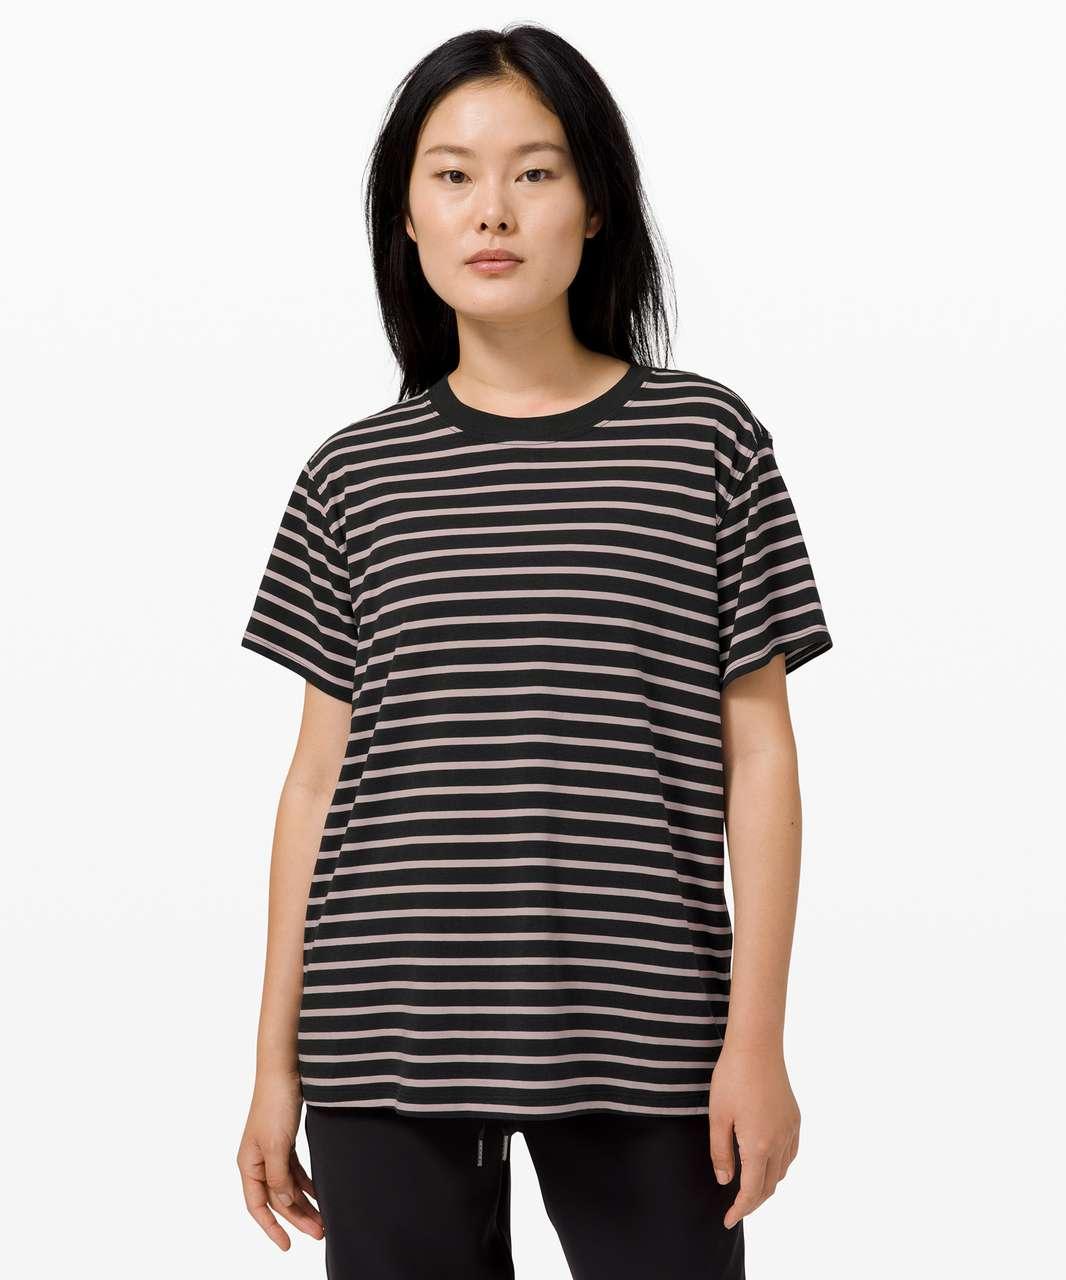 Lululemon All Yours Tee - Yachtie Stripe Black Chrome